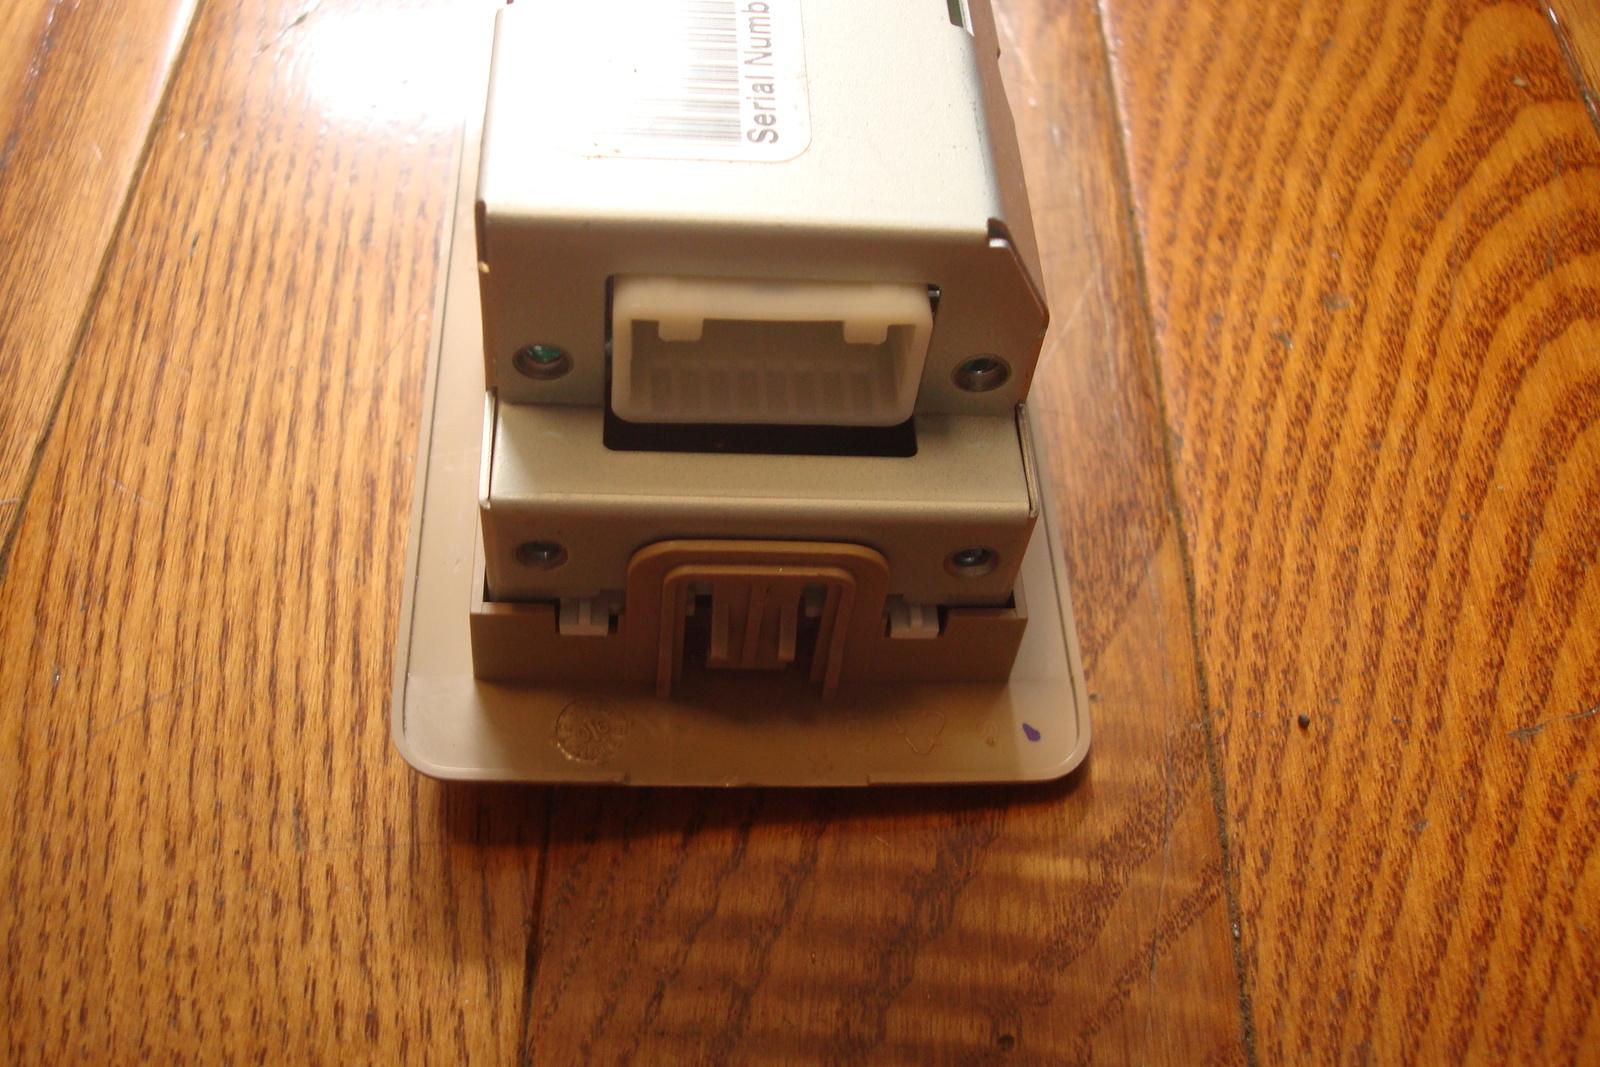 2004-2007 NISSAN QUEST OEM Rear Audio DVD CD Radio AUX Control Switch